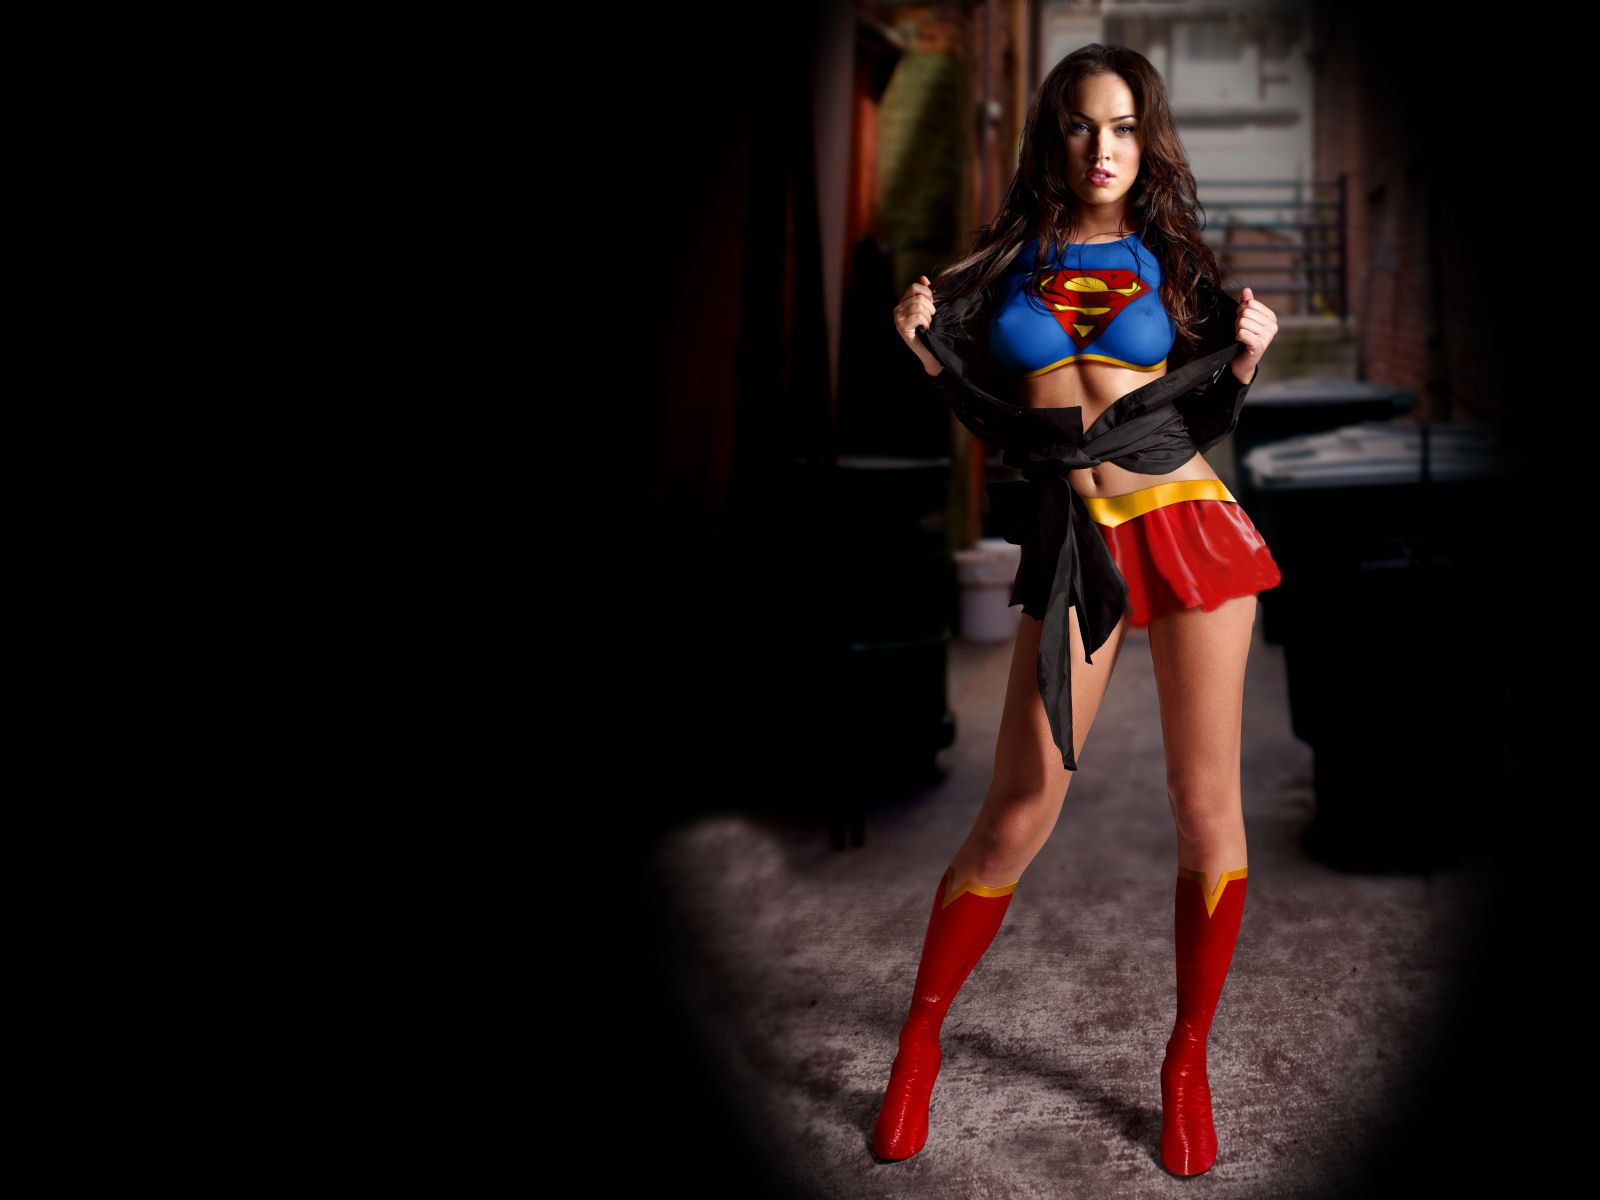 Megan Fox Supergirl Wallpaper | Megan Fox | Pinterest | Supergirl